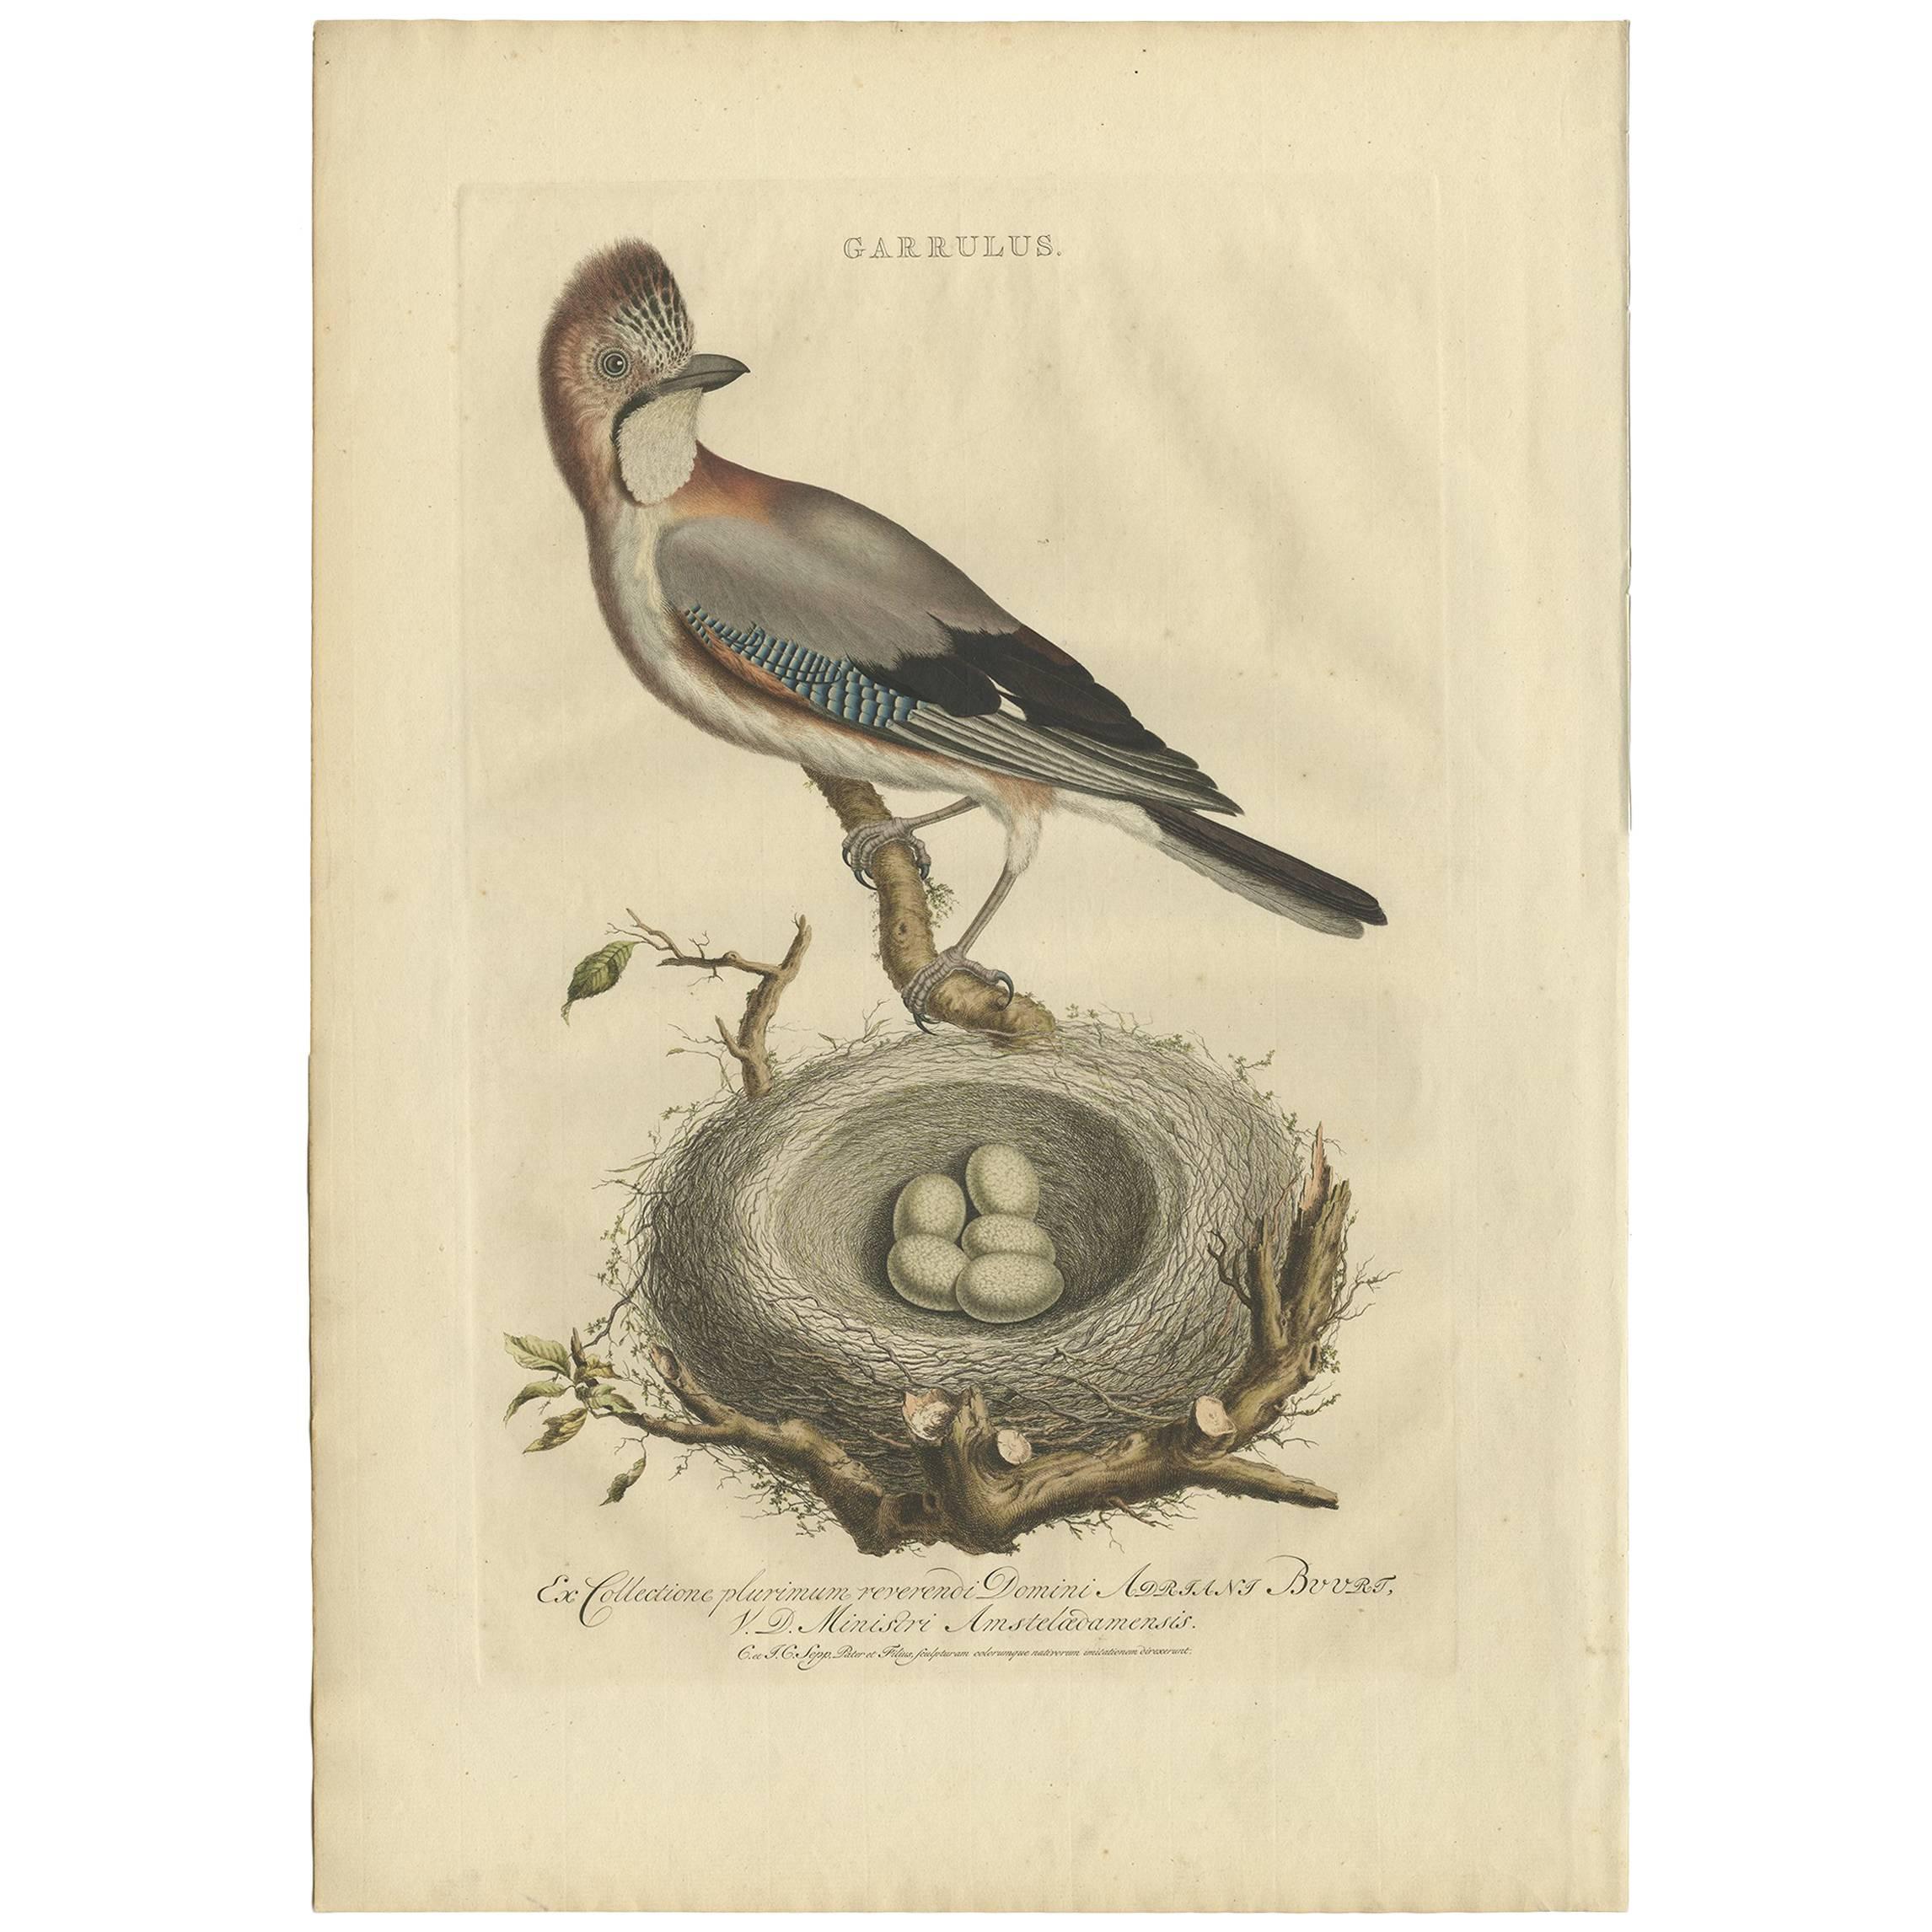 Antique Bird Print of the Garrulus by Sepp & Nozeman, 1770